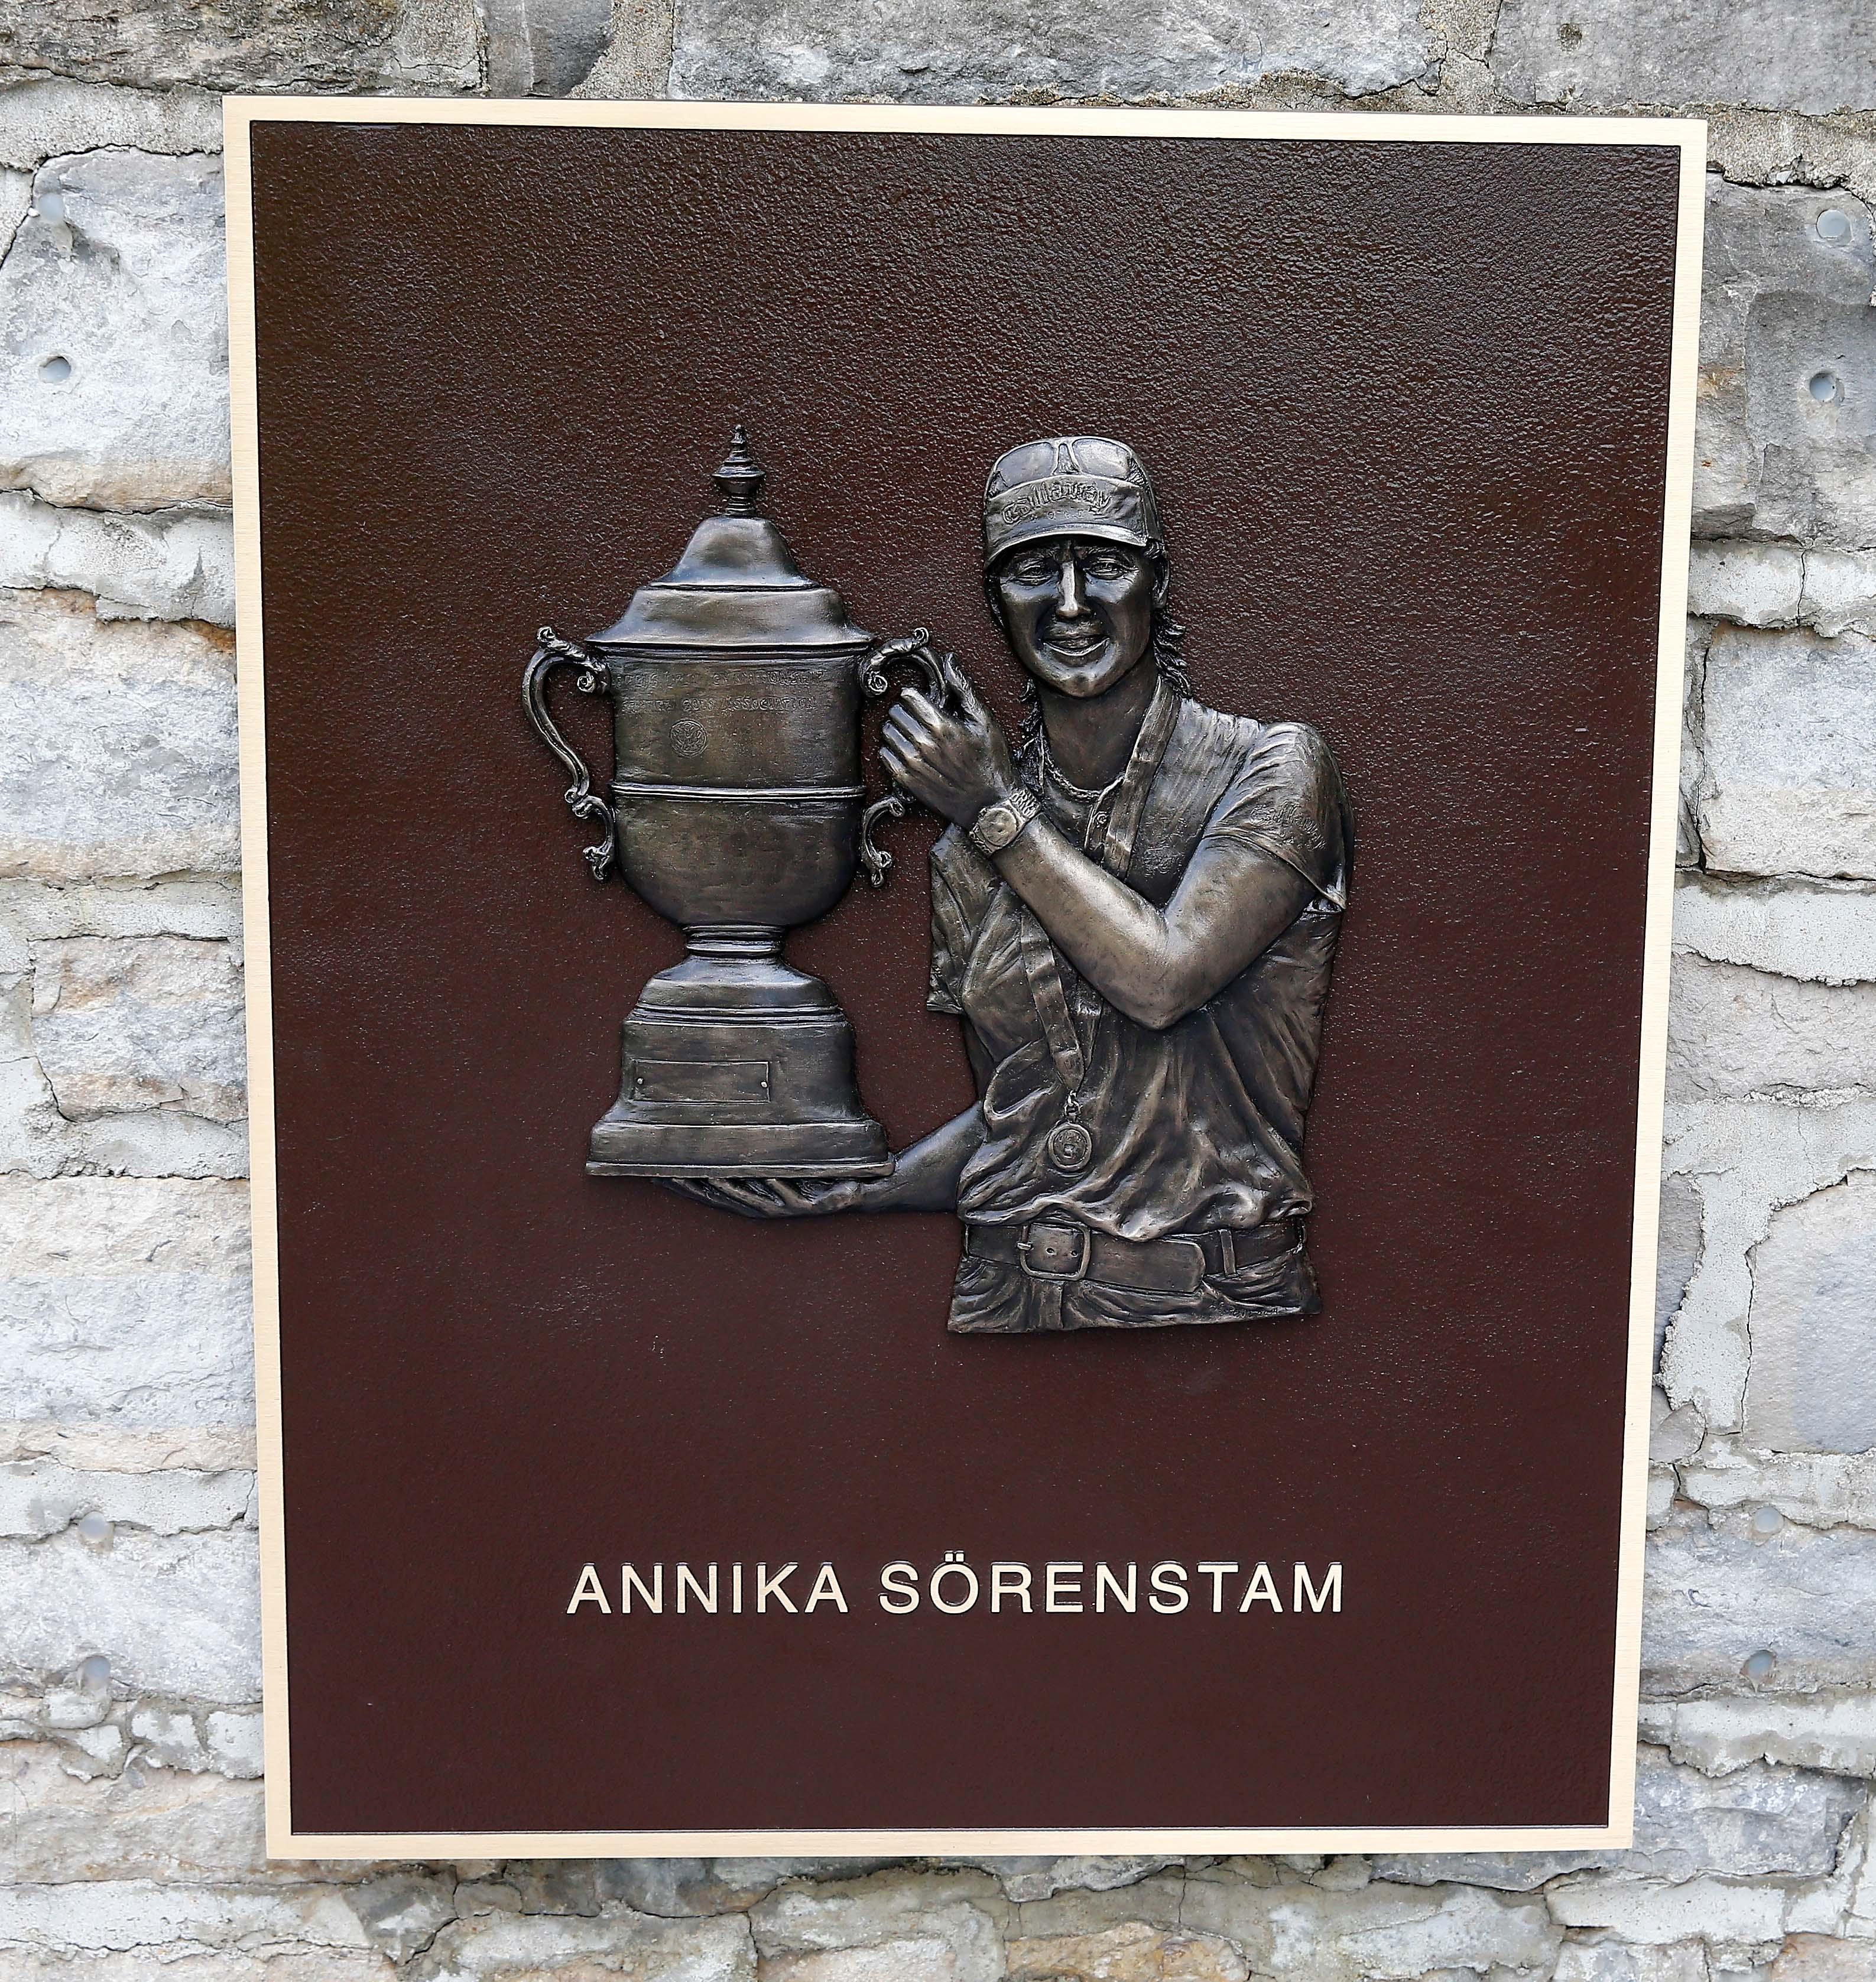 Annika Sorenstam plaque